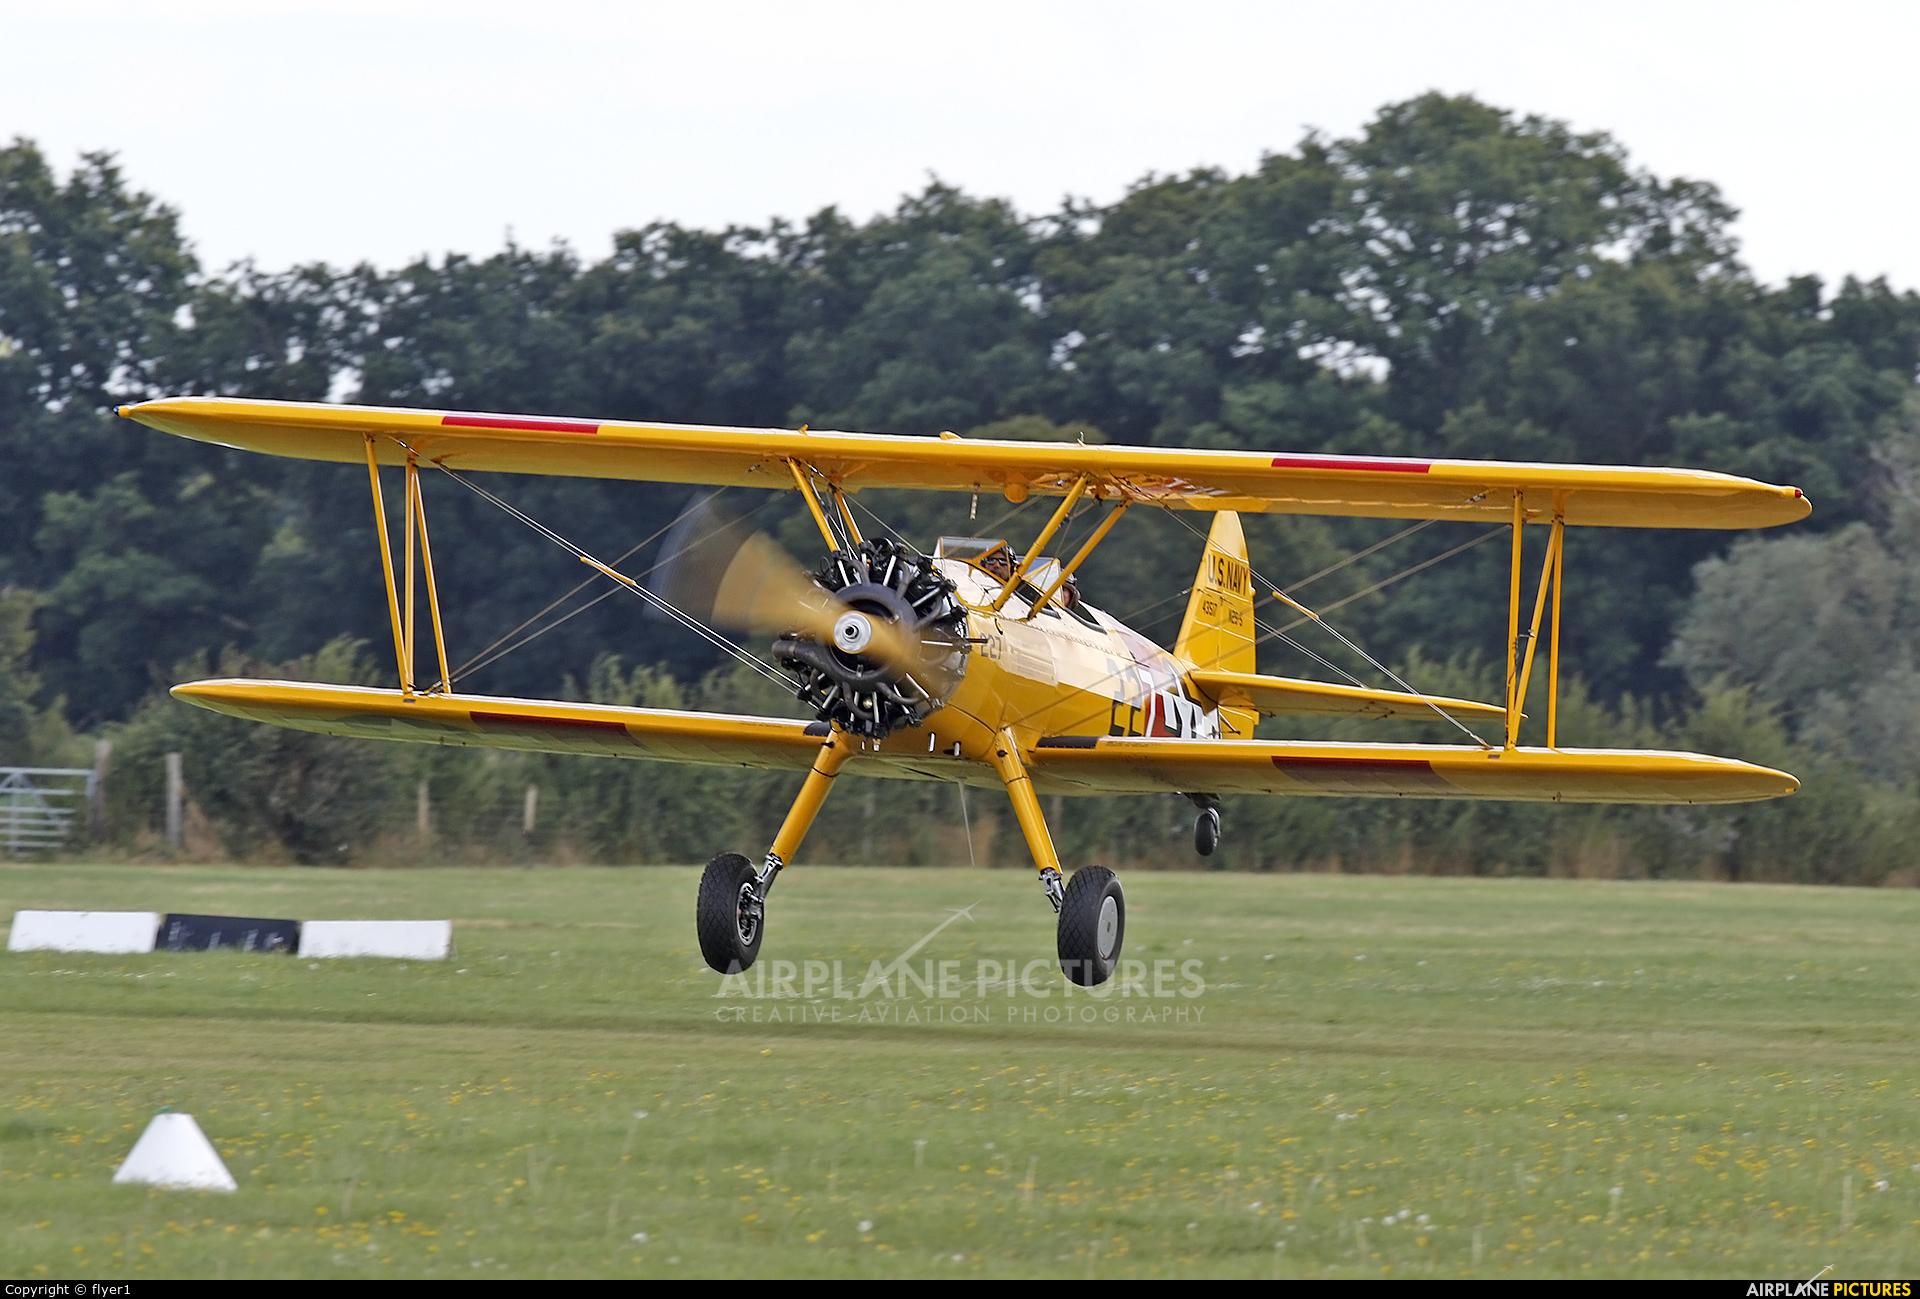 Private G-NZSS aircraft at Lashenden / Headcorn